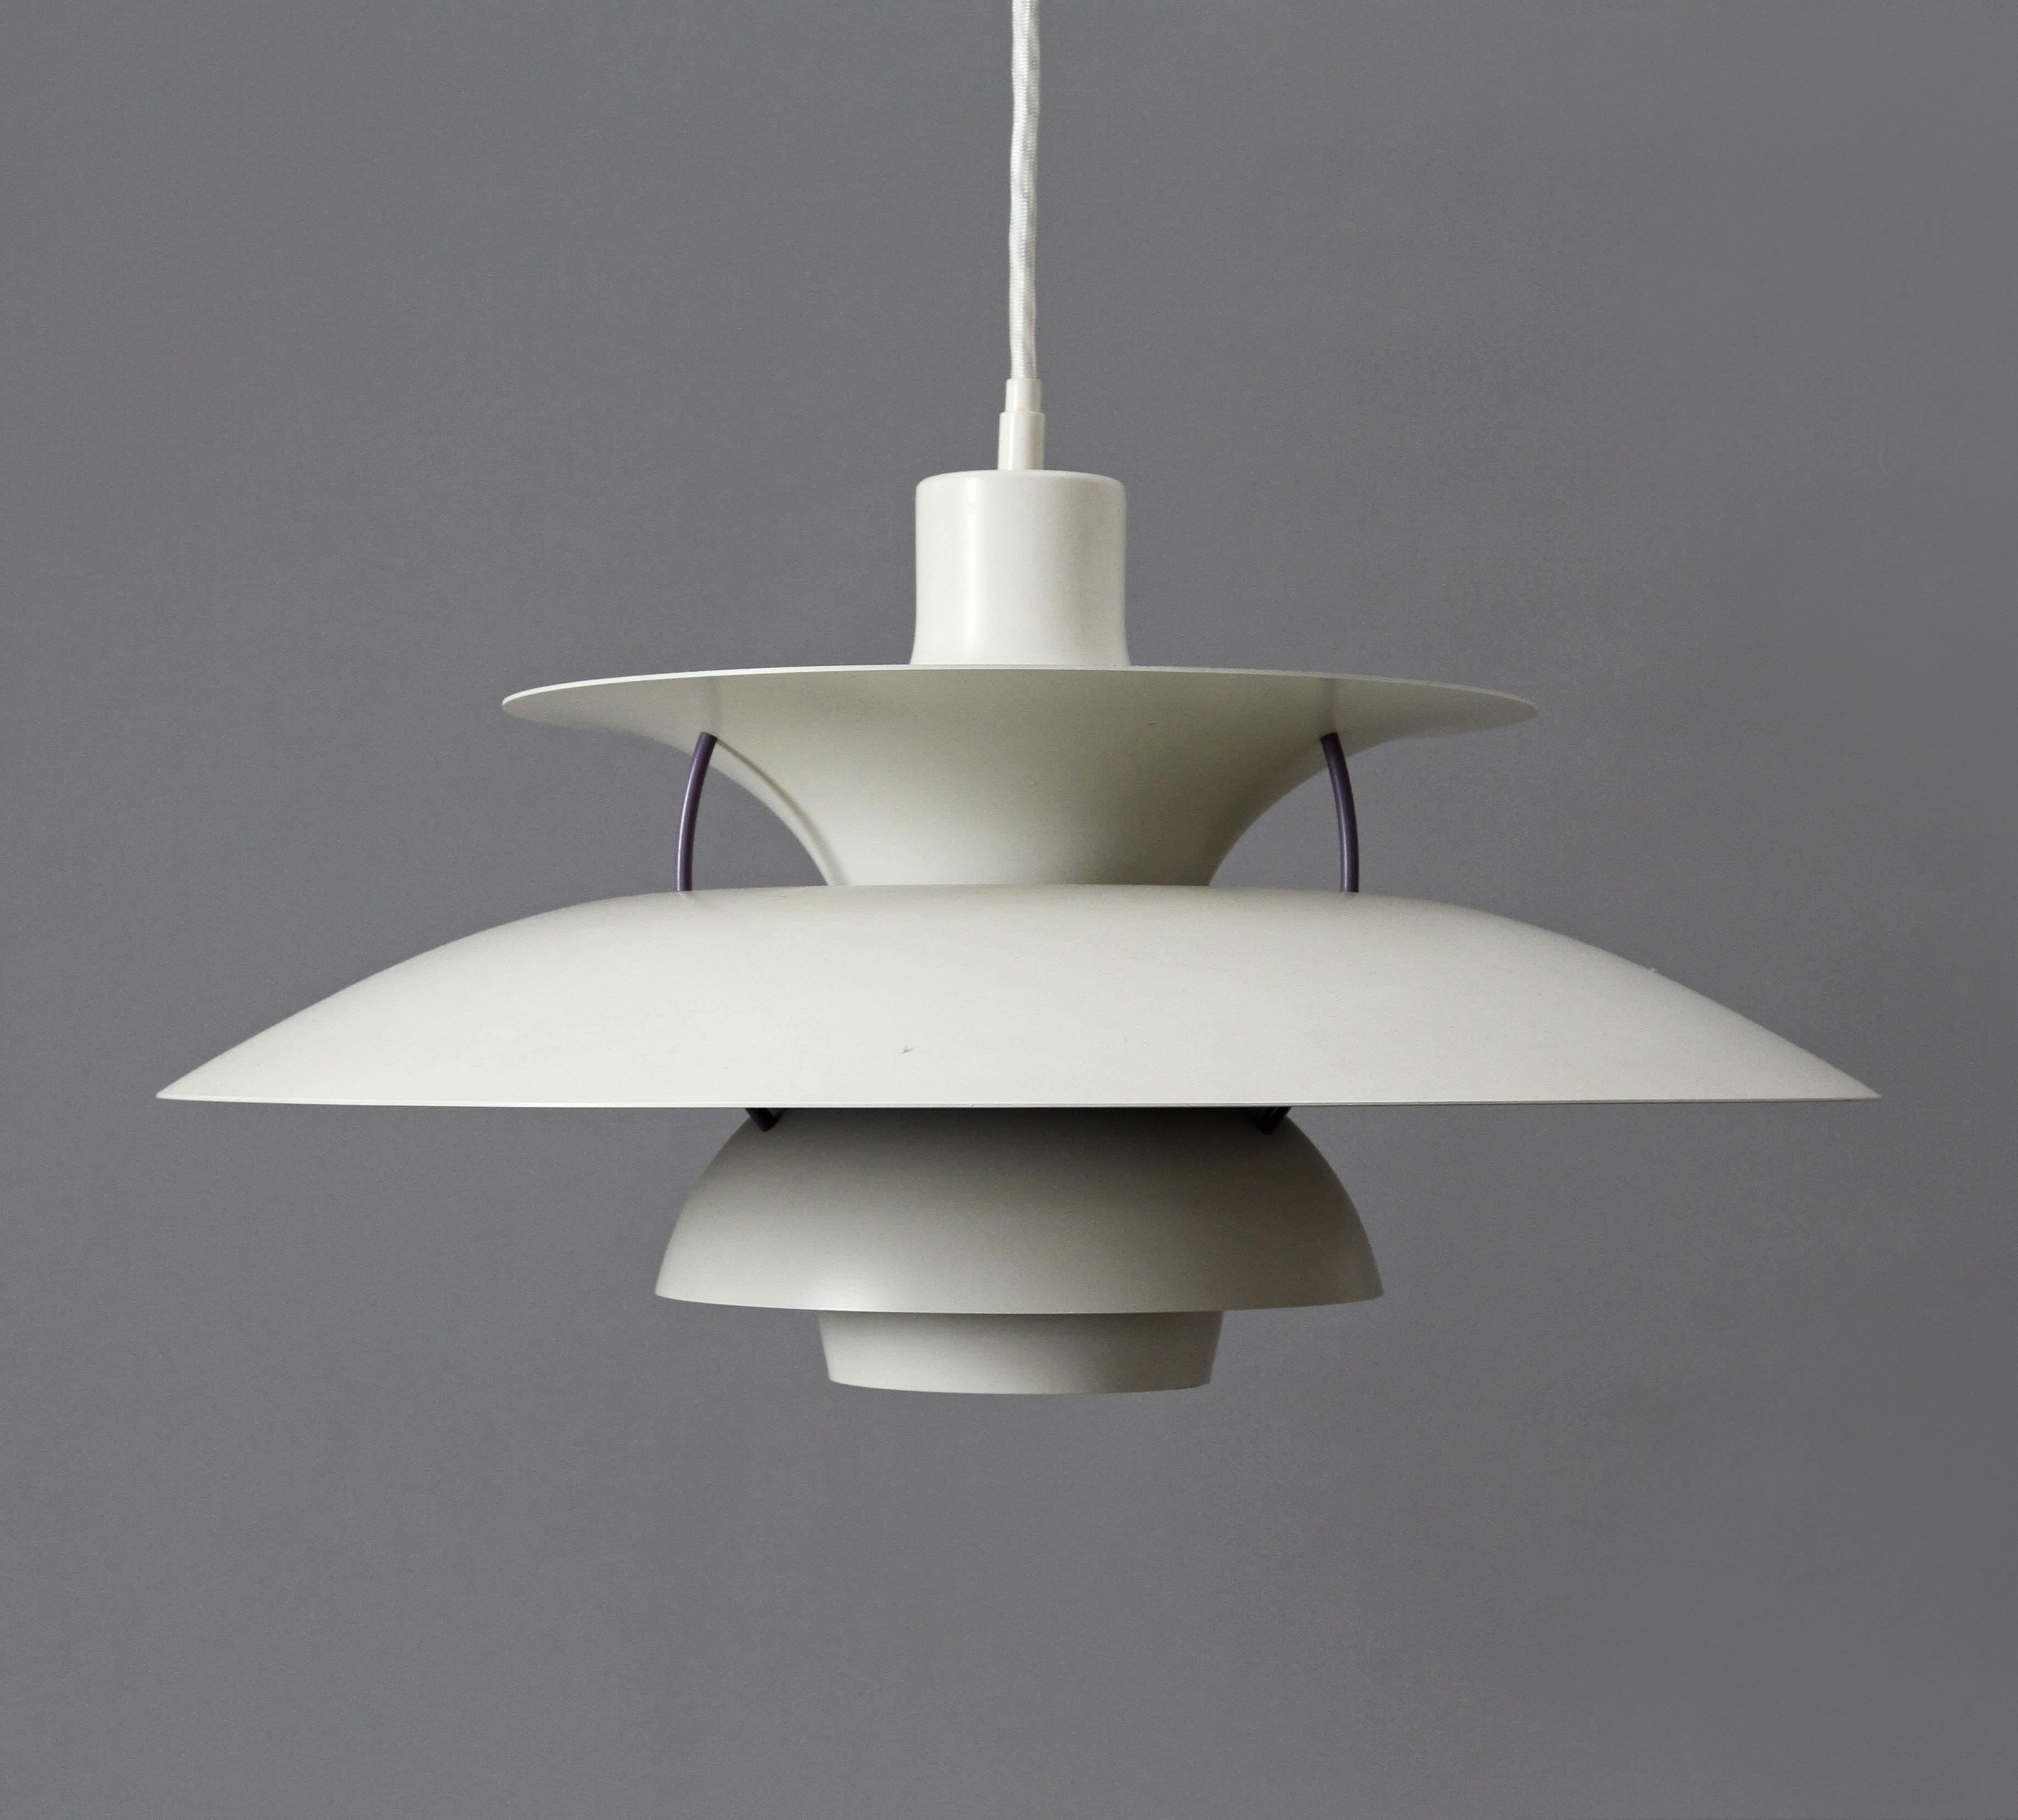 PH 5 Louis Poulsen | Interior lighting, Poulsen lamp